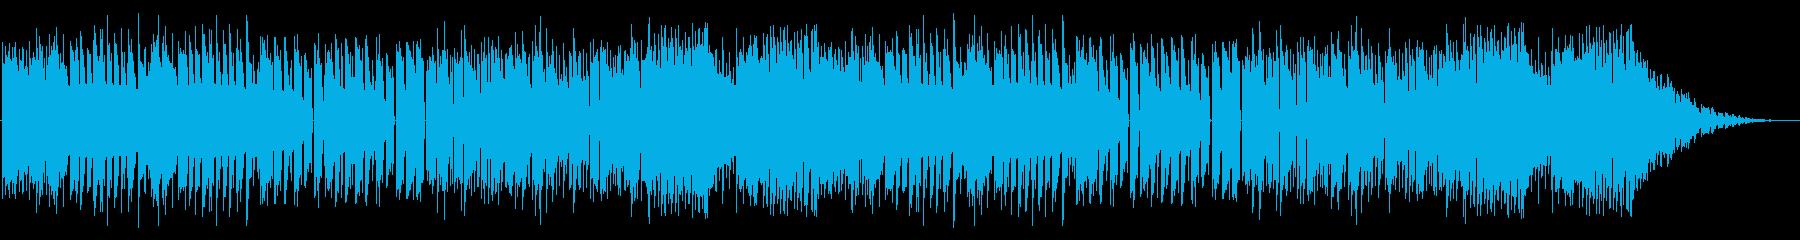 NES STG C03-1(ステージ2)の再生済みの波形